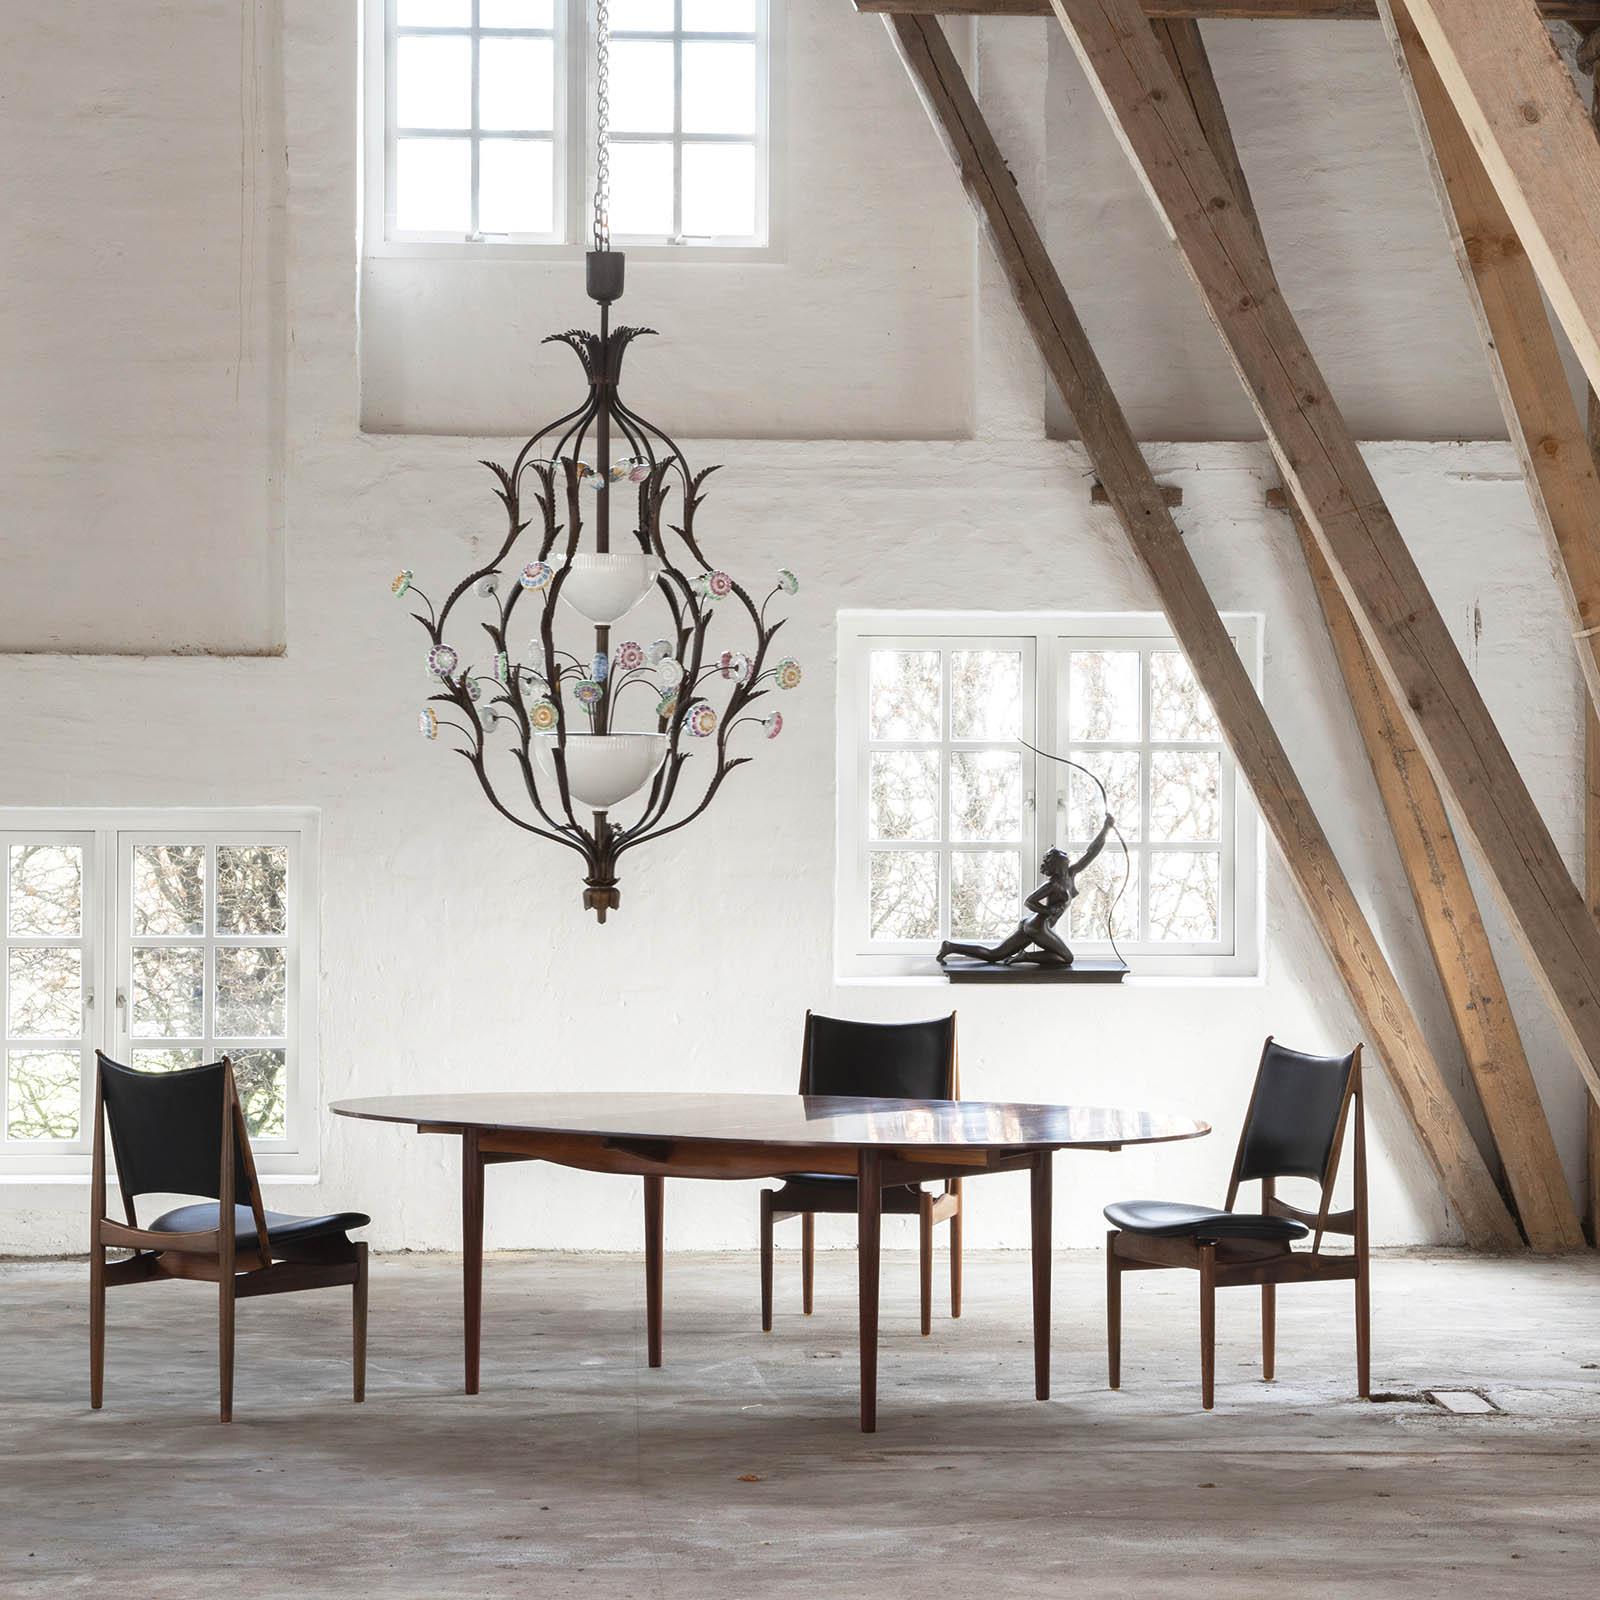 An impressive chandelier